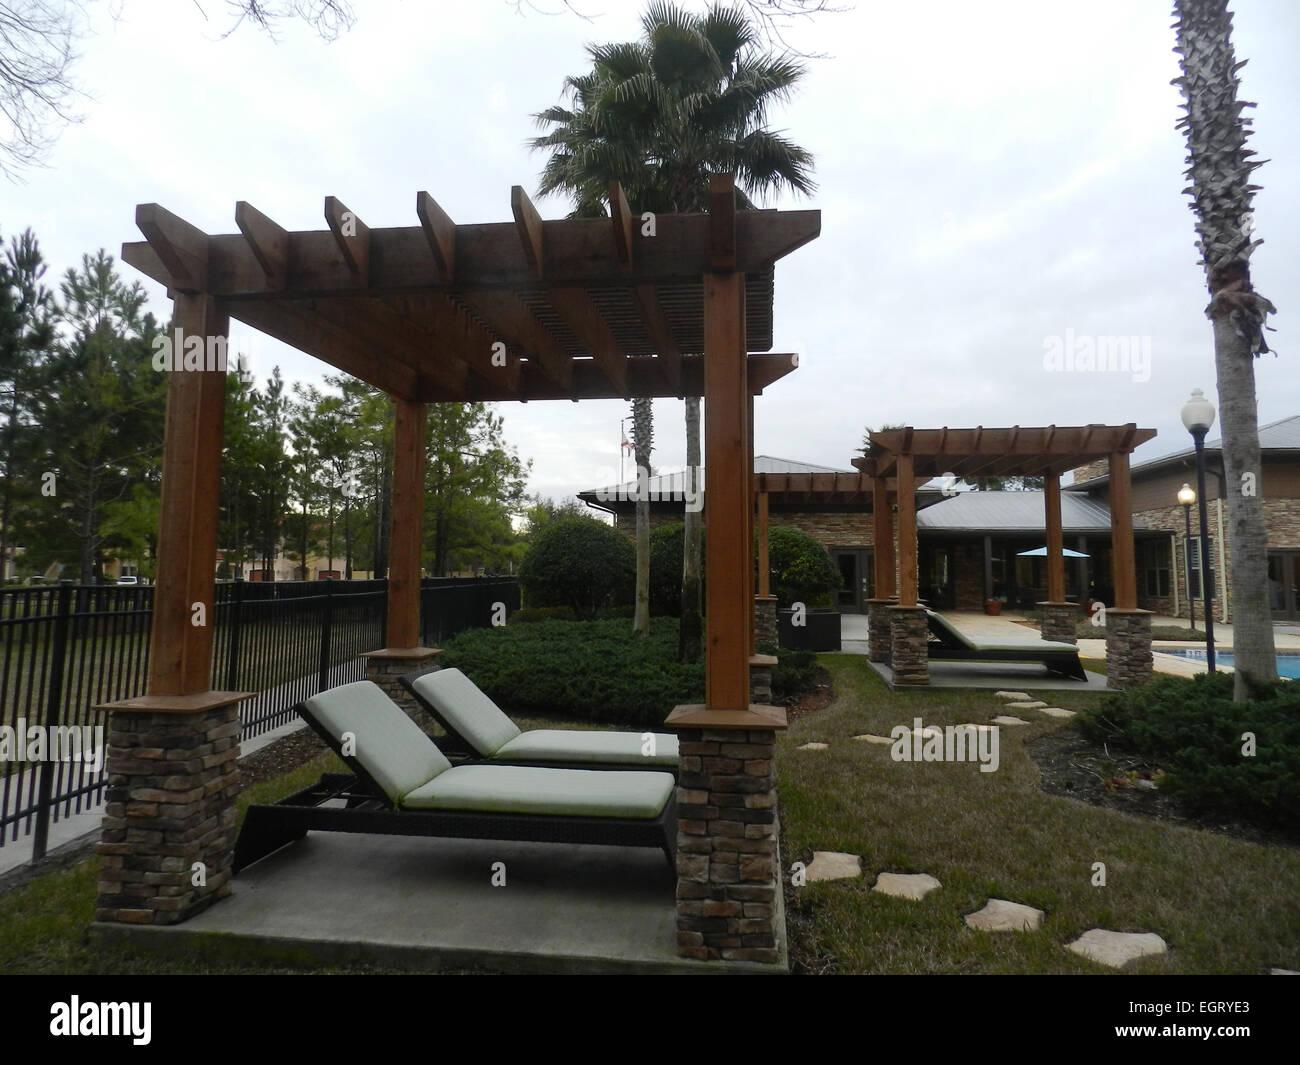 Garden Terrace In Mediterranean Style Environment   Condominium Style In  Florida   Stock Image